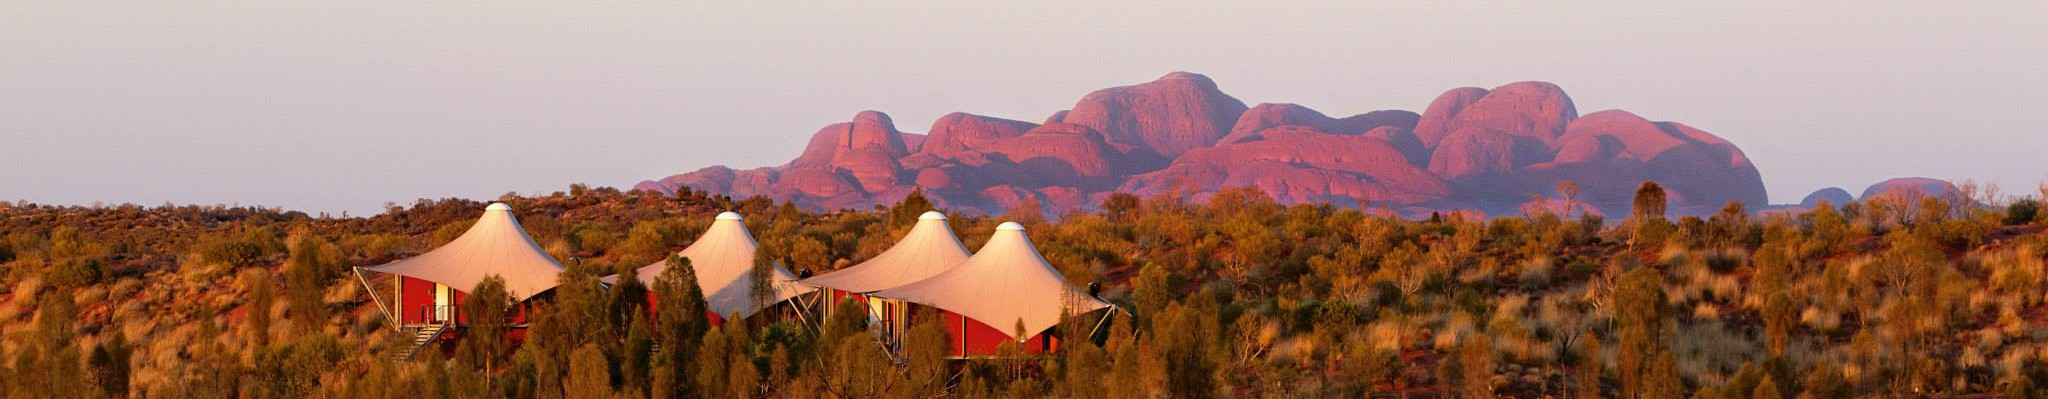 australia outback tents & australia outback tents |